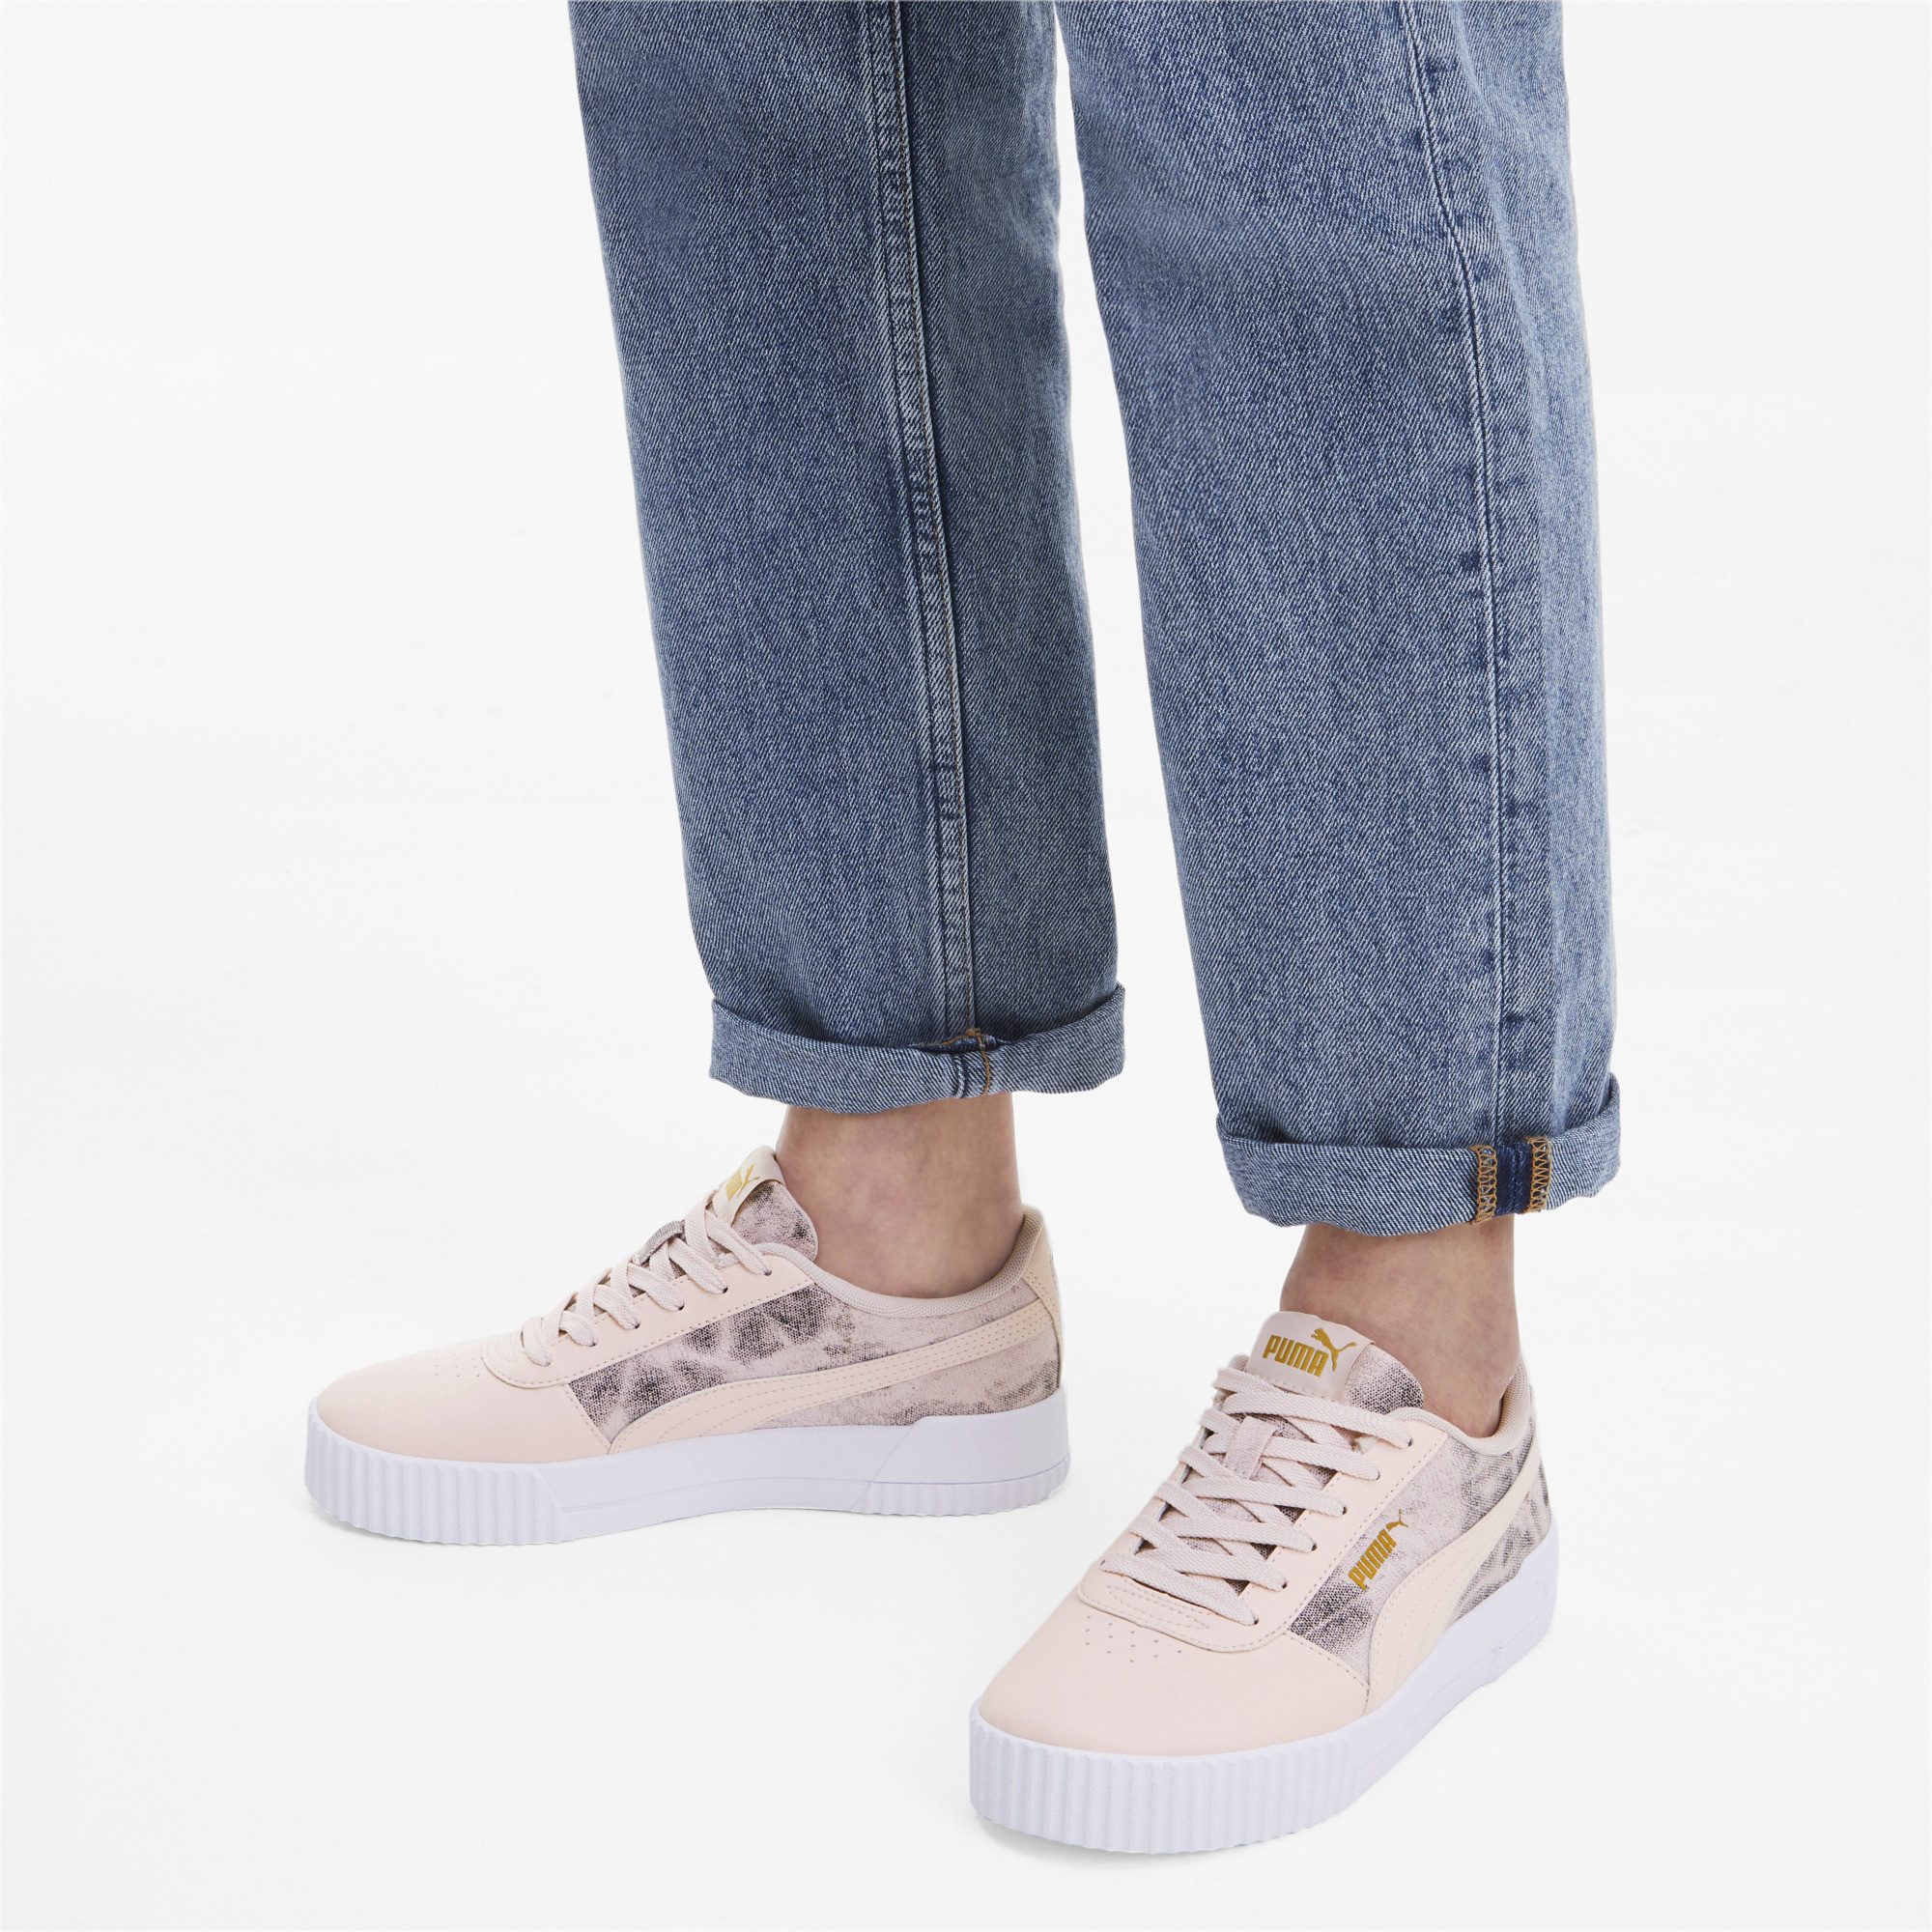 PUMA-Women-039-s-Carina-Tie-Dye-Sneakers thumbnail 5